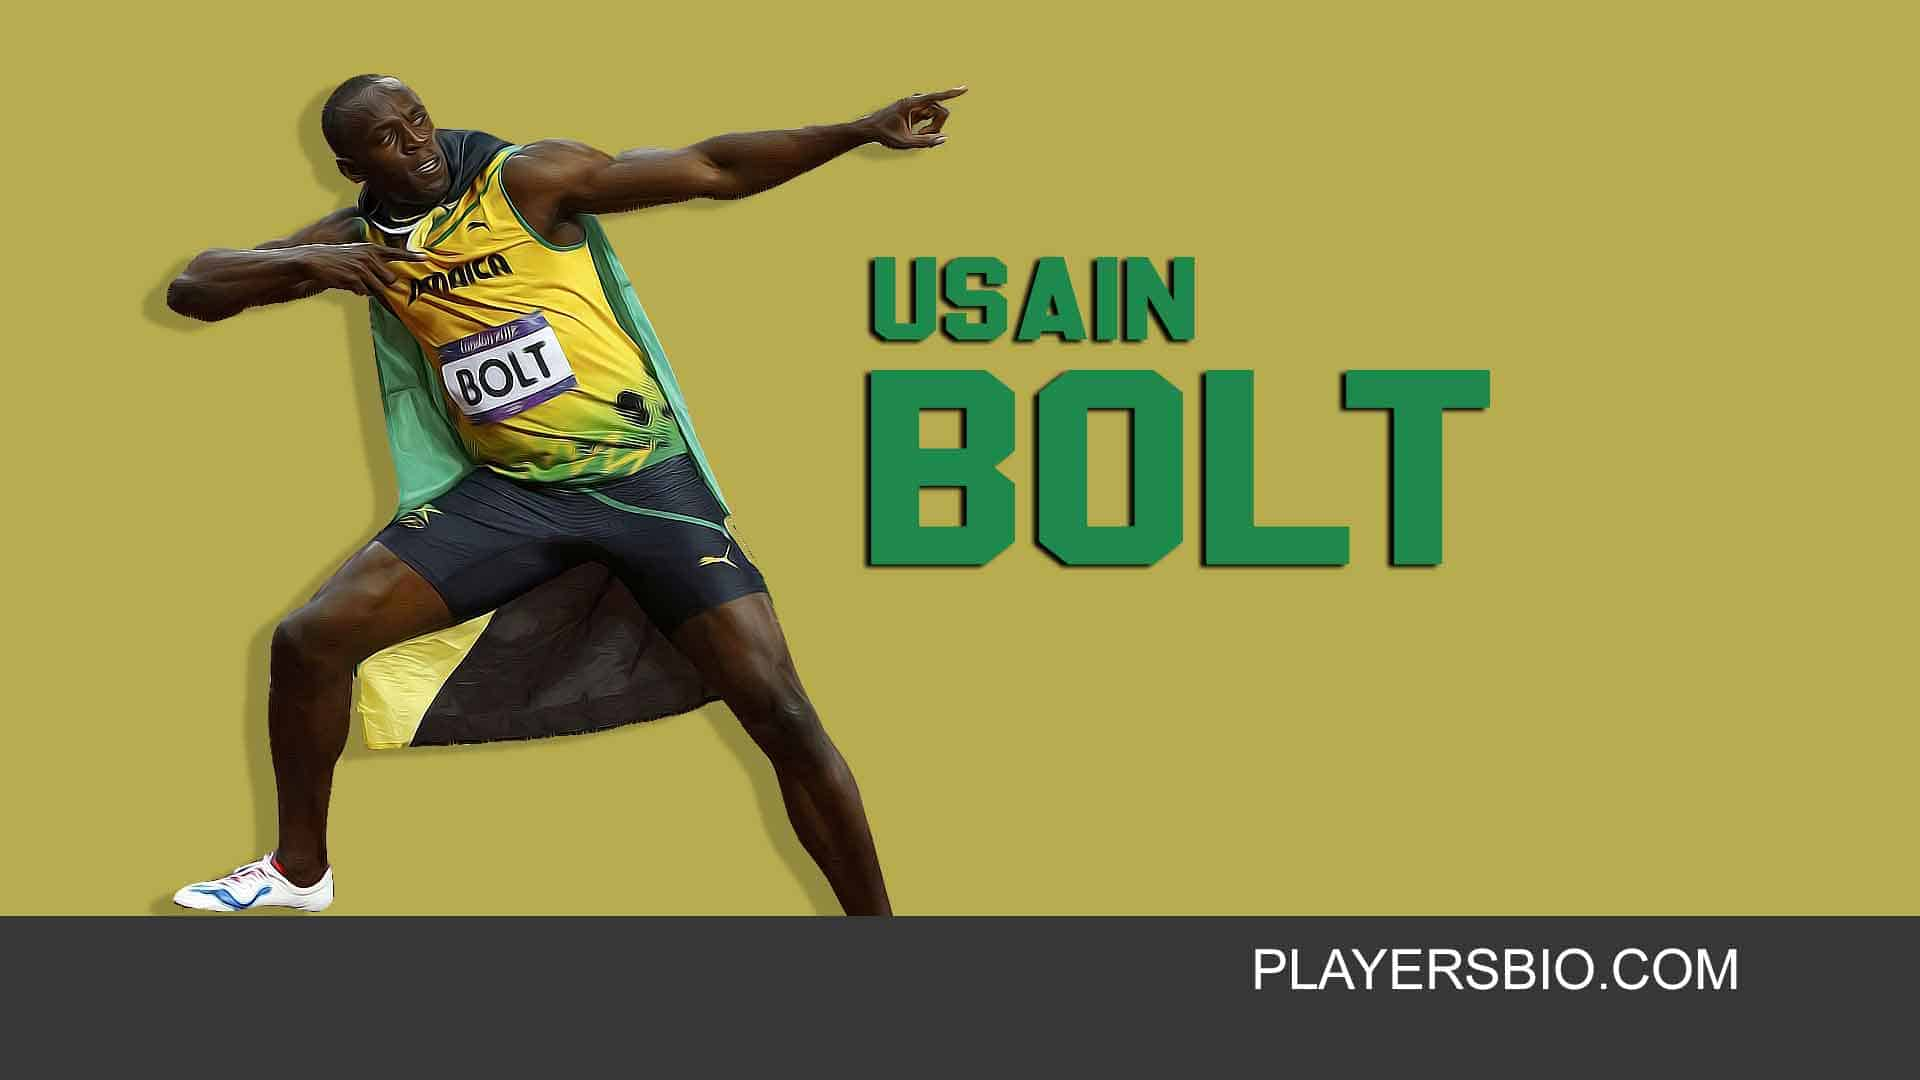 Top 74 Usain Bolt Quotes - Players Bio